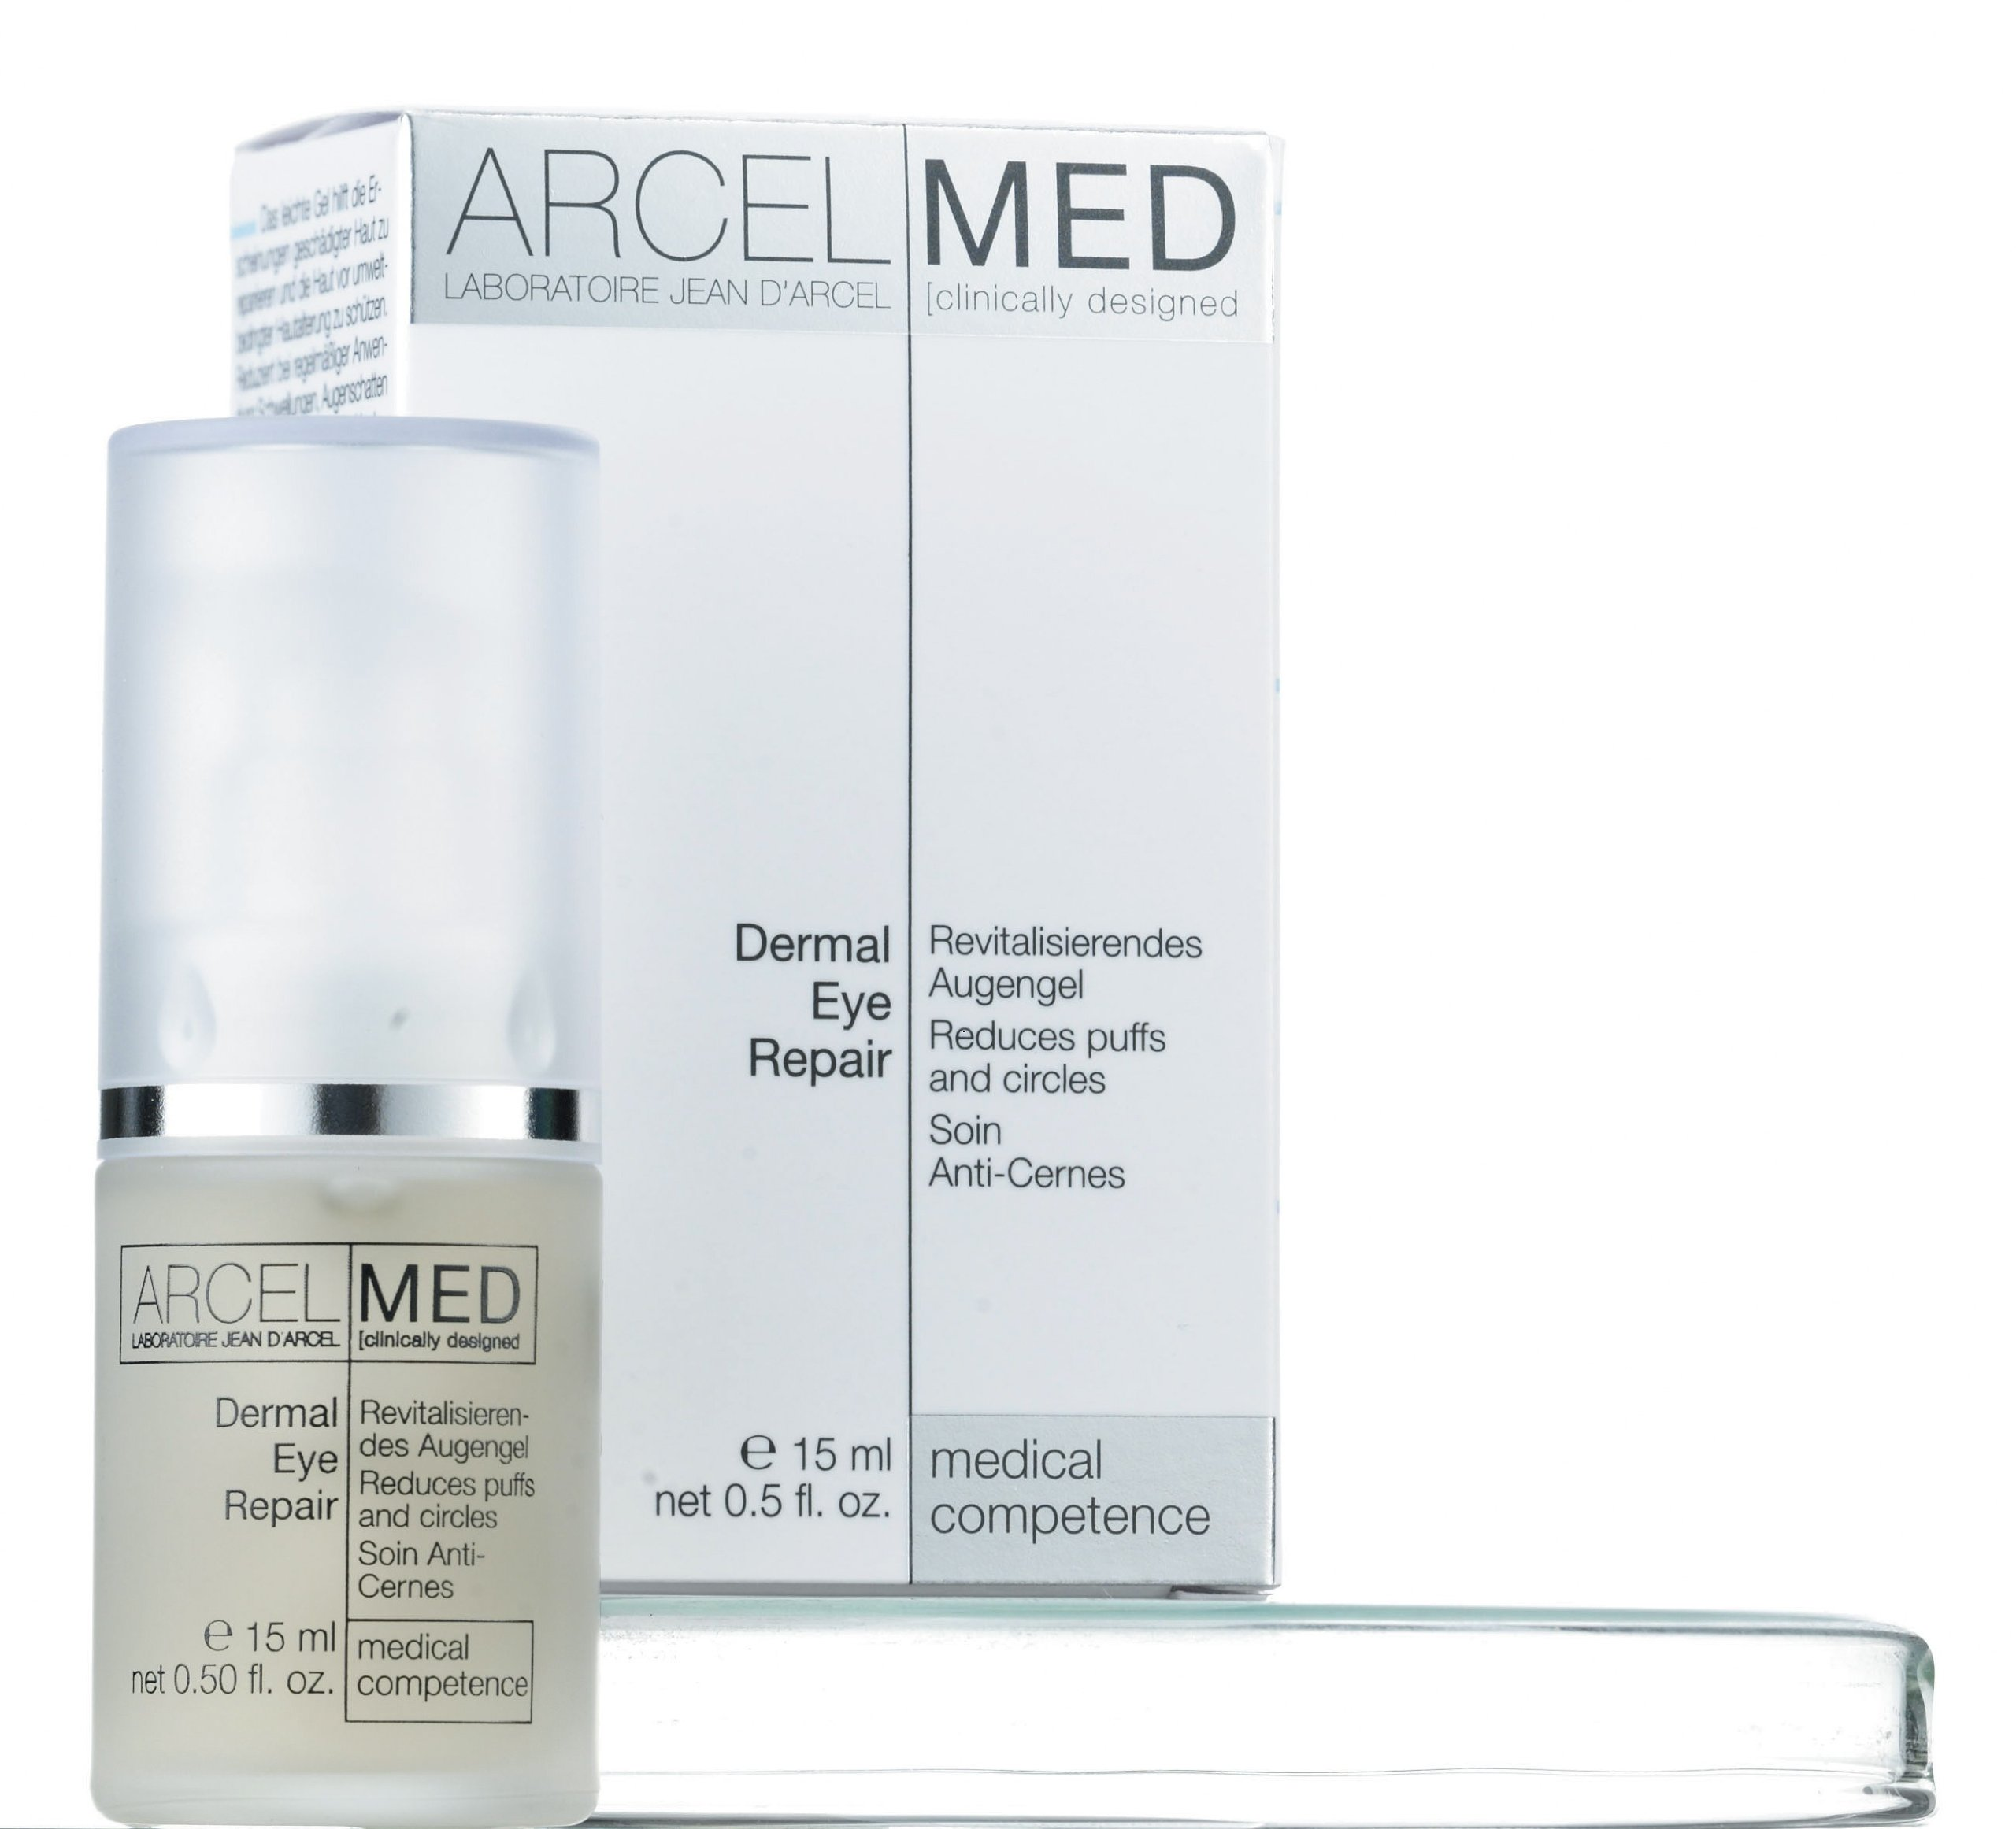 ARCELMED Laboratoire Jean D'Arcel Dermal Eye Repair Gel, 15 ml / 0.5 fl.oz.